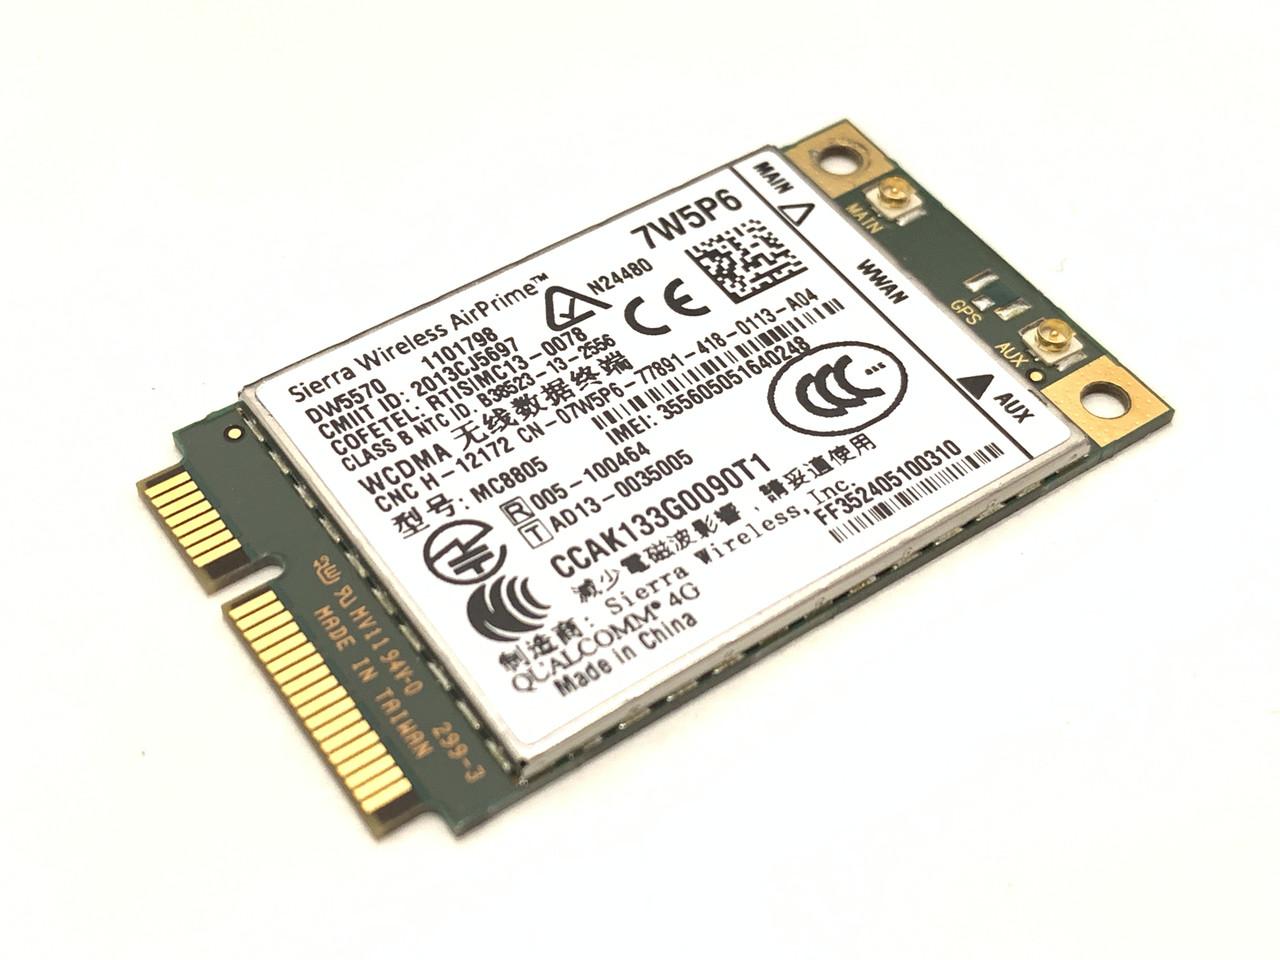 4G модем Sierra Wireless AirPrim MC8805 DW5570 QUALCOMM 4G для ноутбуков Dell / Б/У Гарантия 6 месяцев